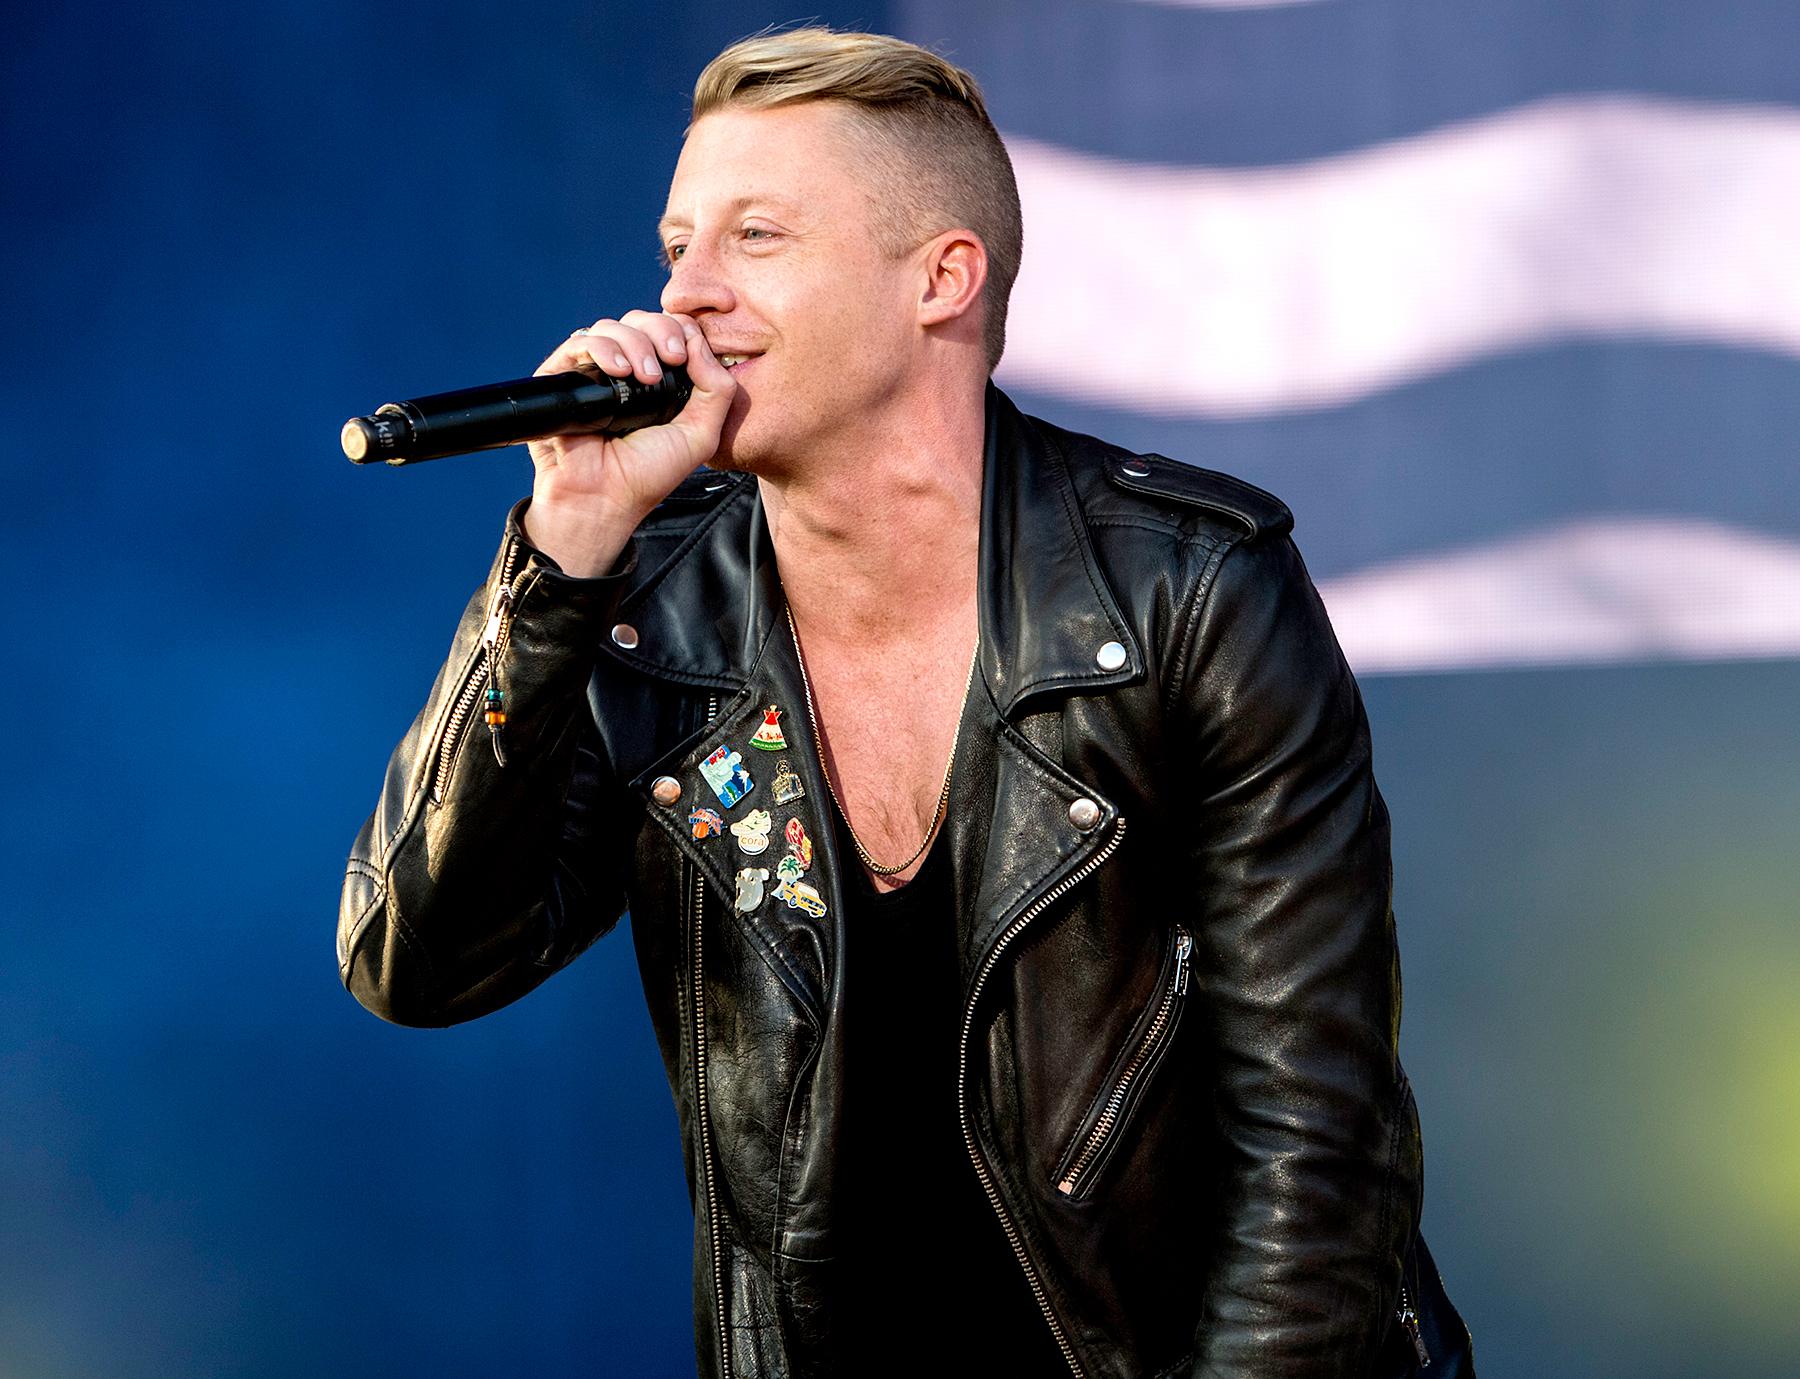 Macklemore of Macklemore & Ryan Lewis performs on stage at Leeds Festival at Bramham Park on August 22, 2014 in Leeds, United Kingdom.